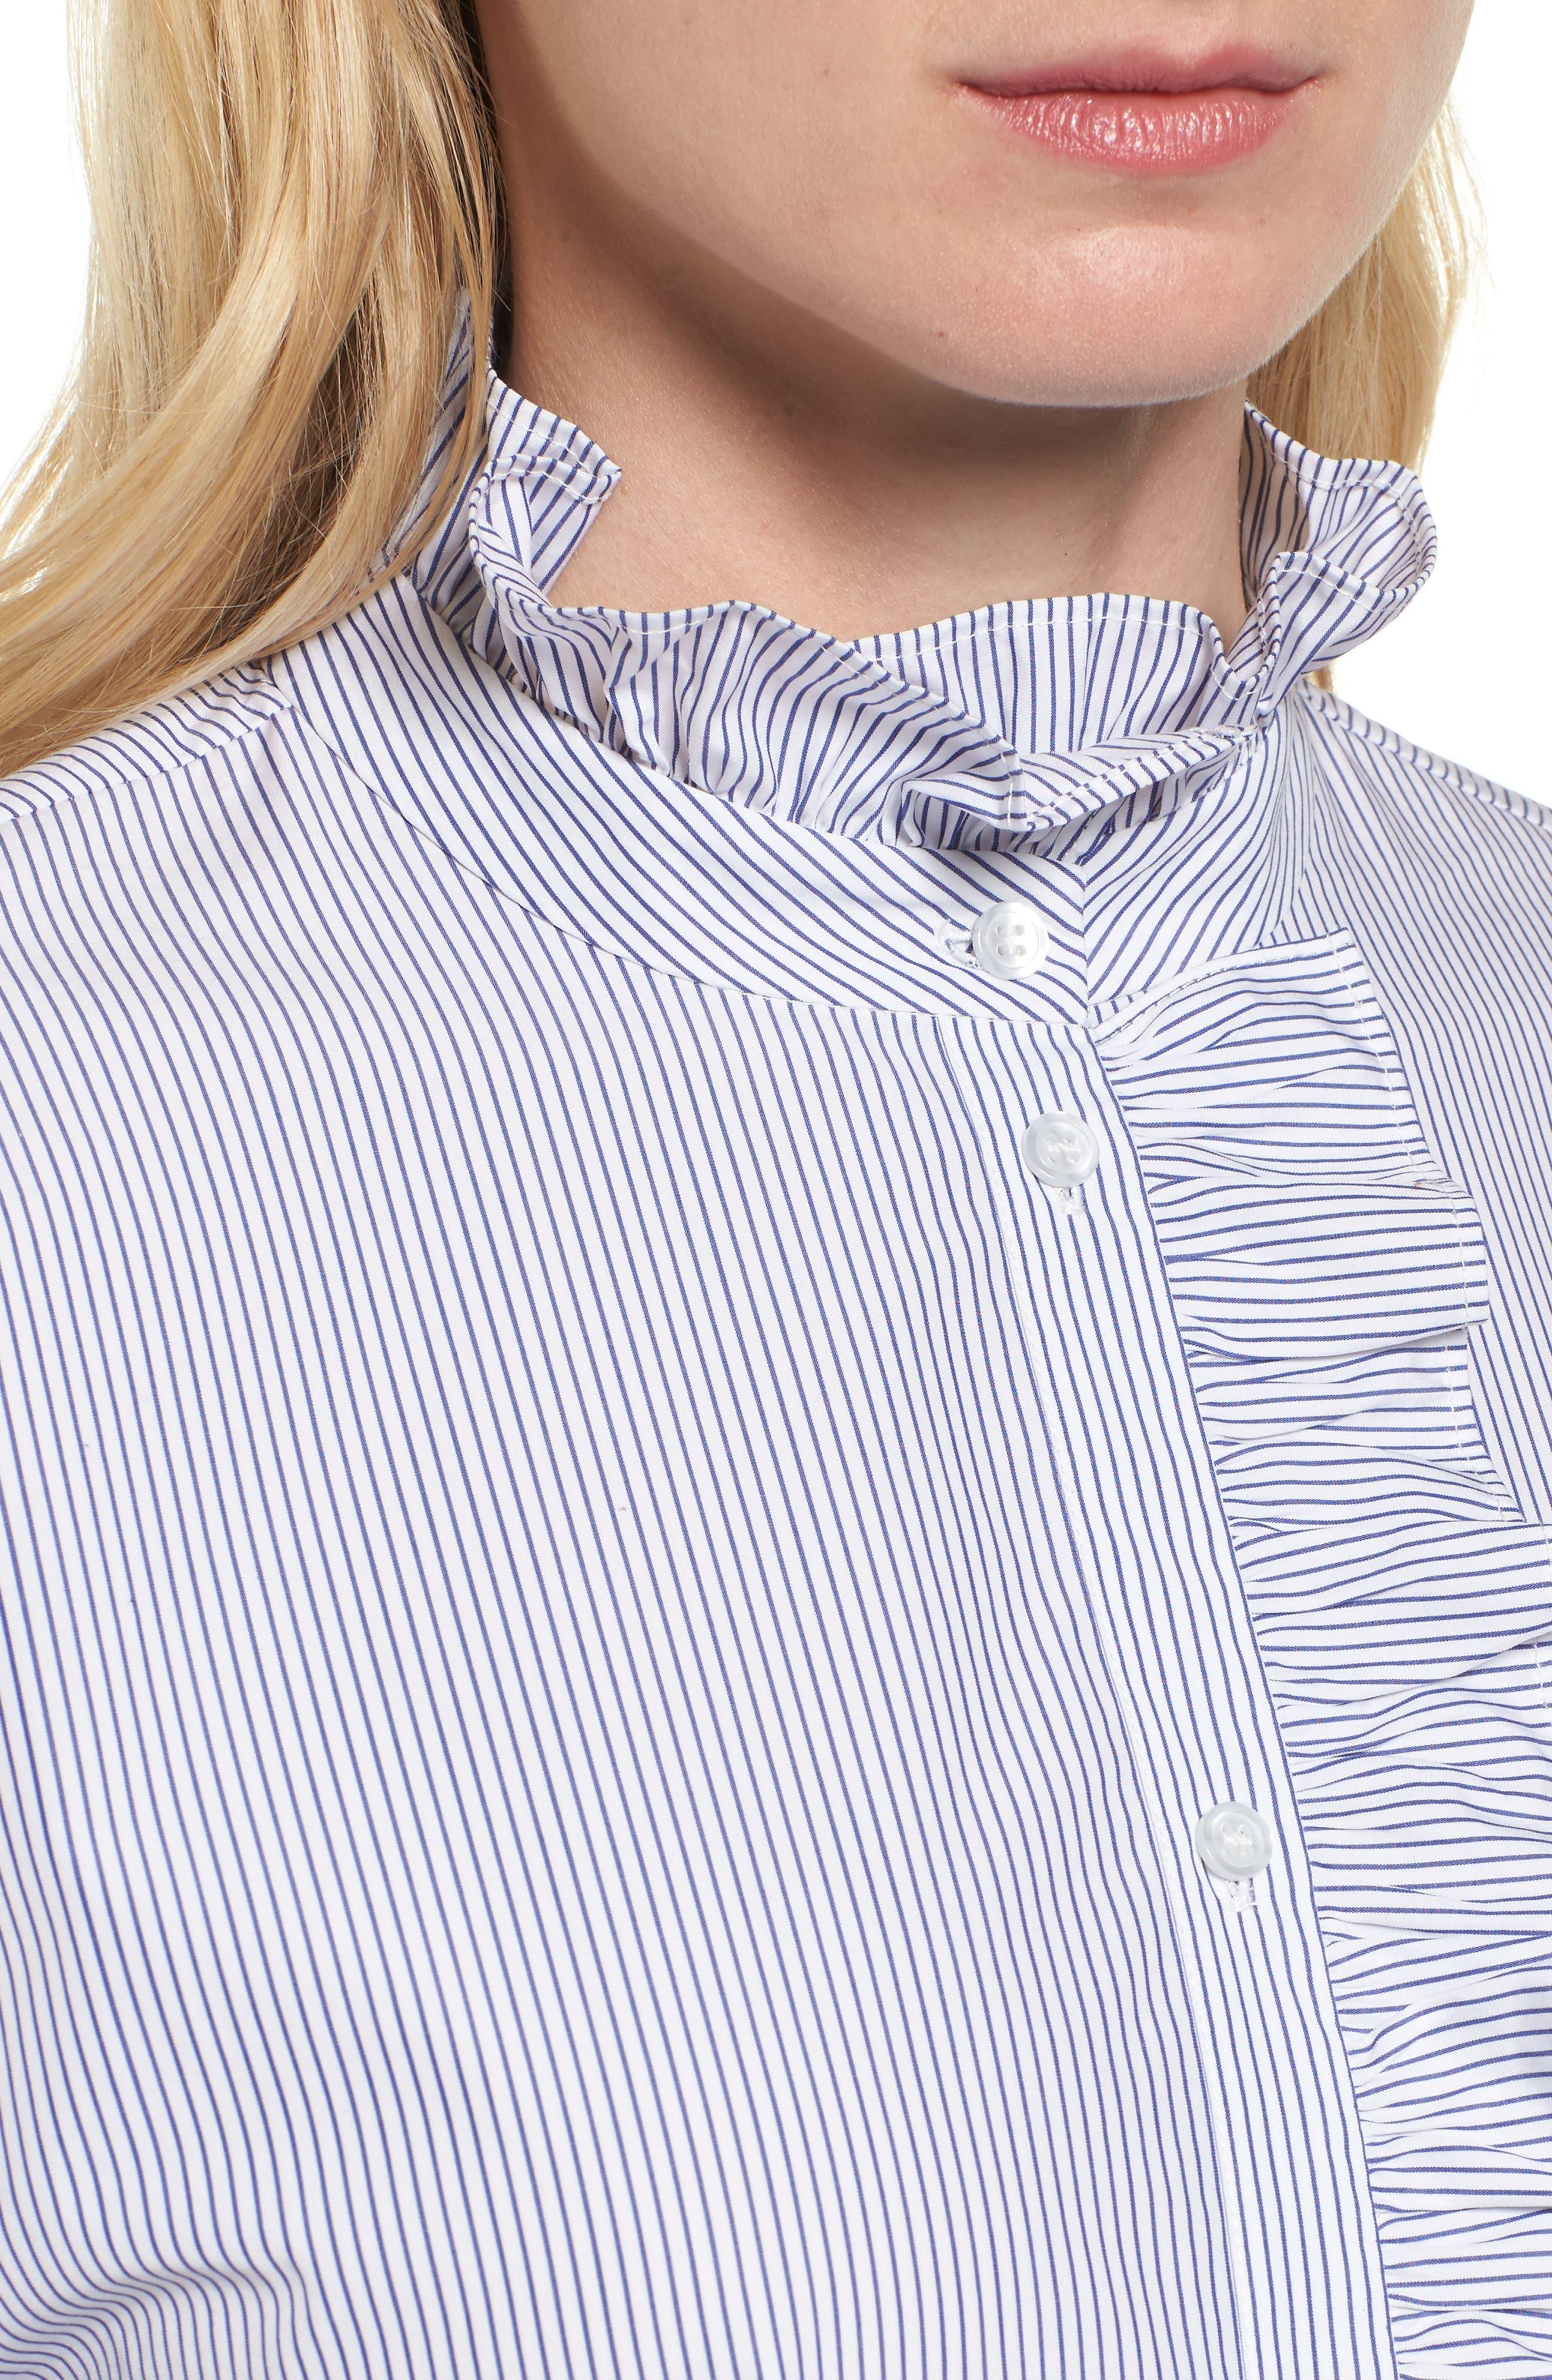 Ruffle Stripe Shirt,                             Alternate thumbnail 4, color,